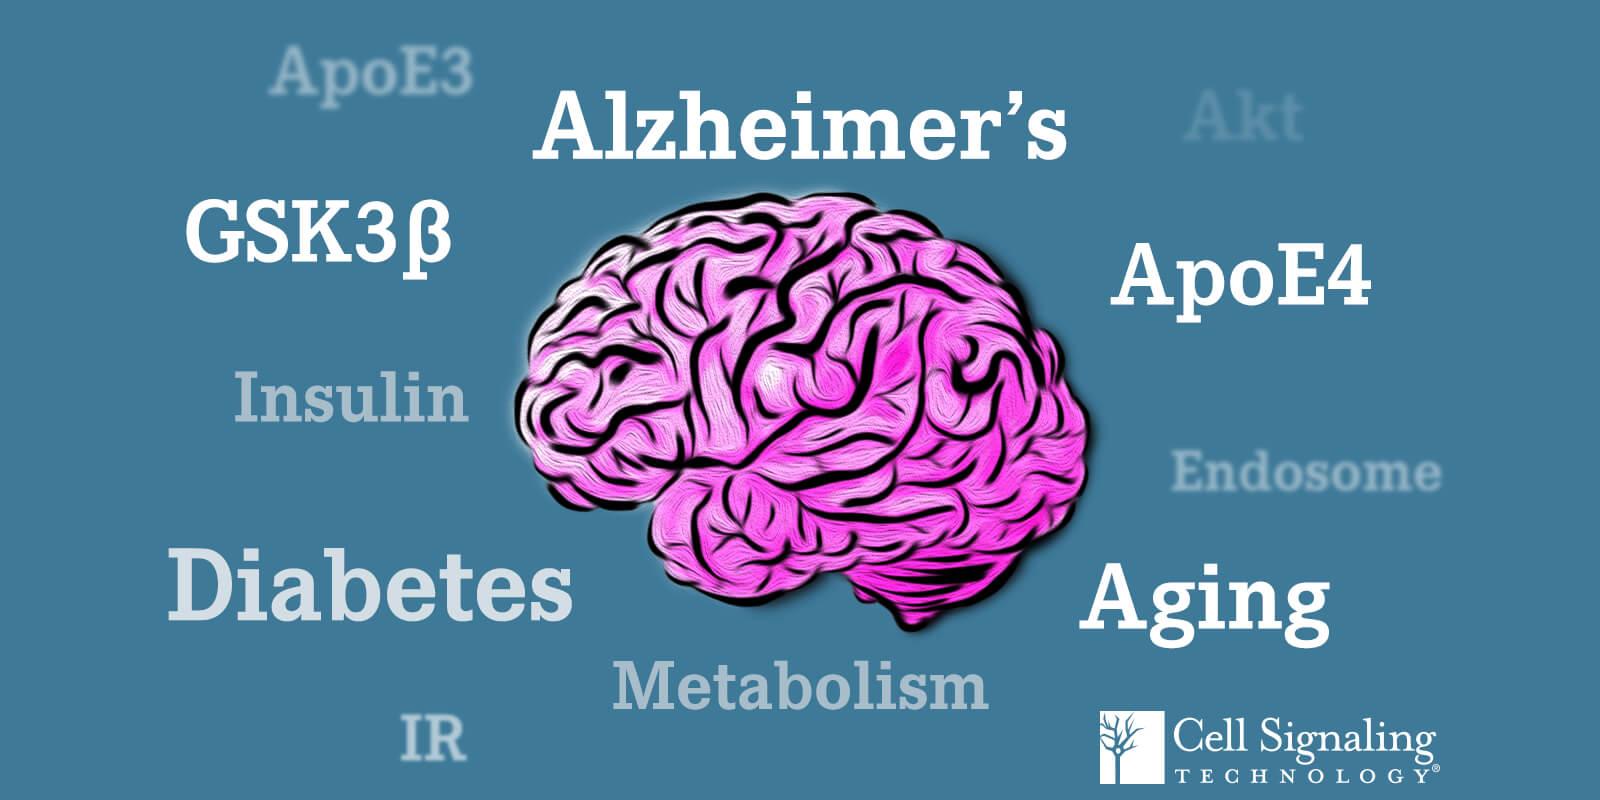 ApoE3   ApoE4   Akt   老化   阿尔兹海默病   代谢   胰岛素   糖尿病